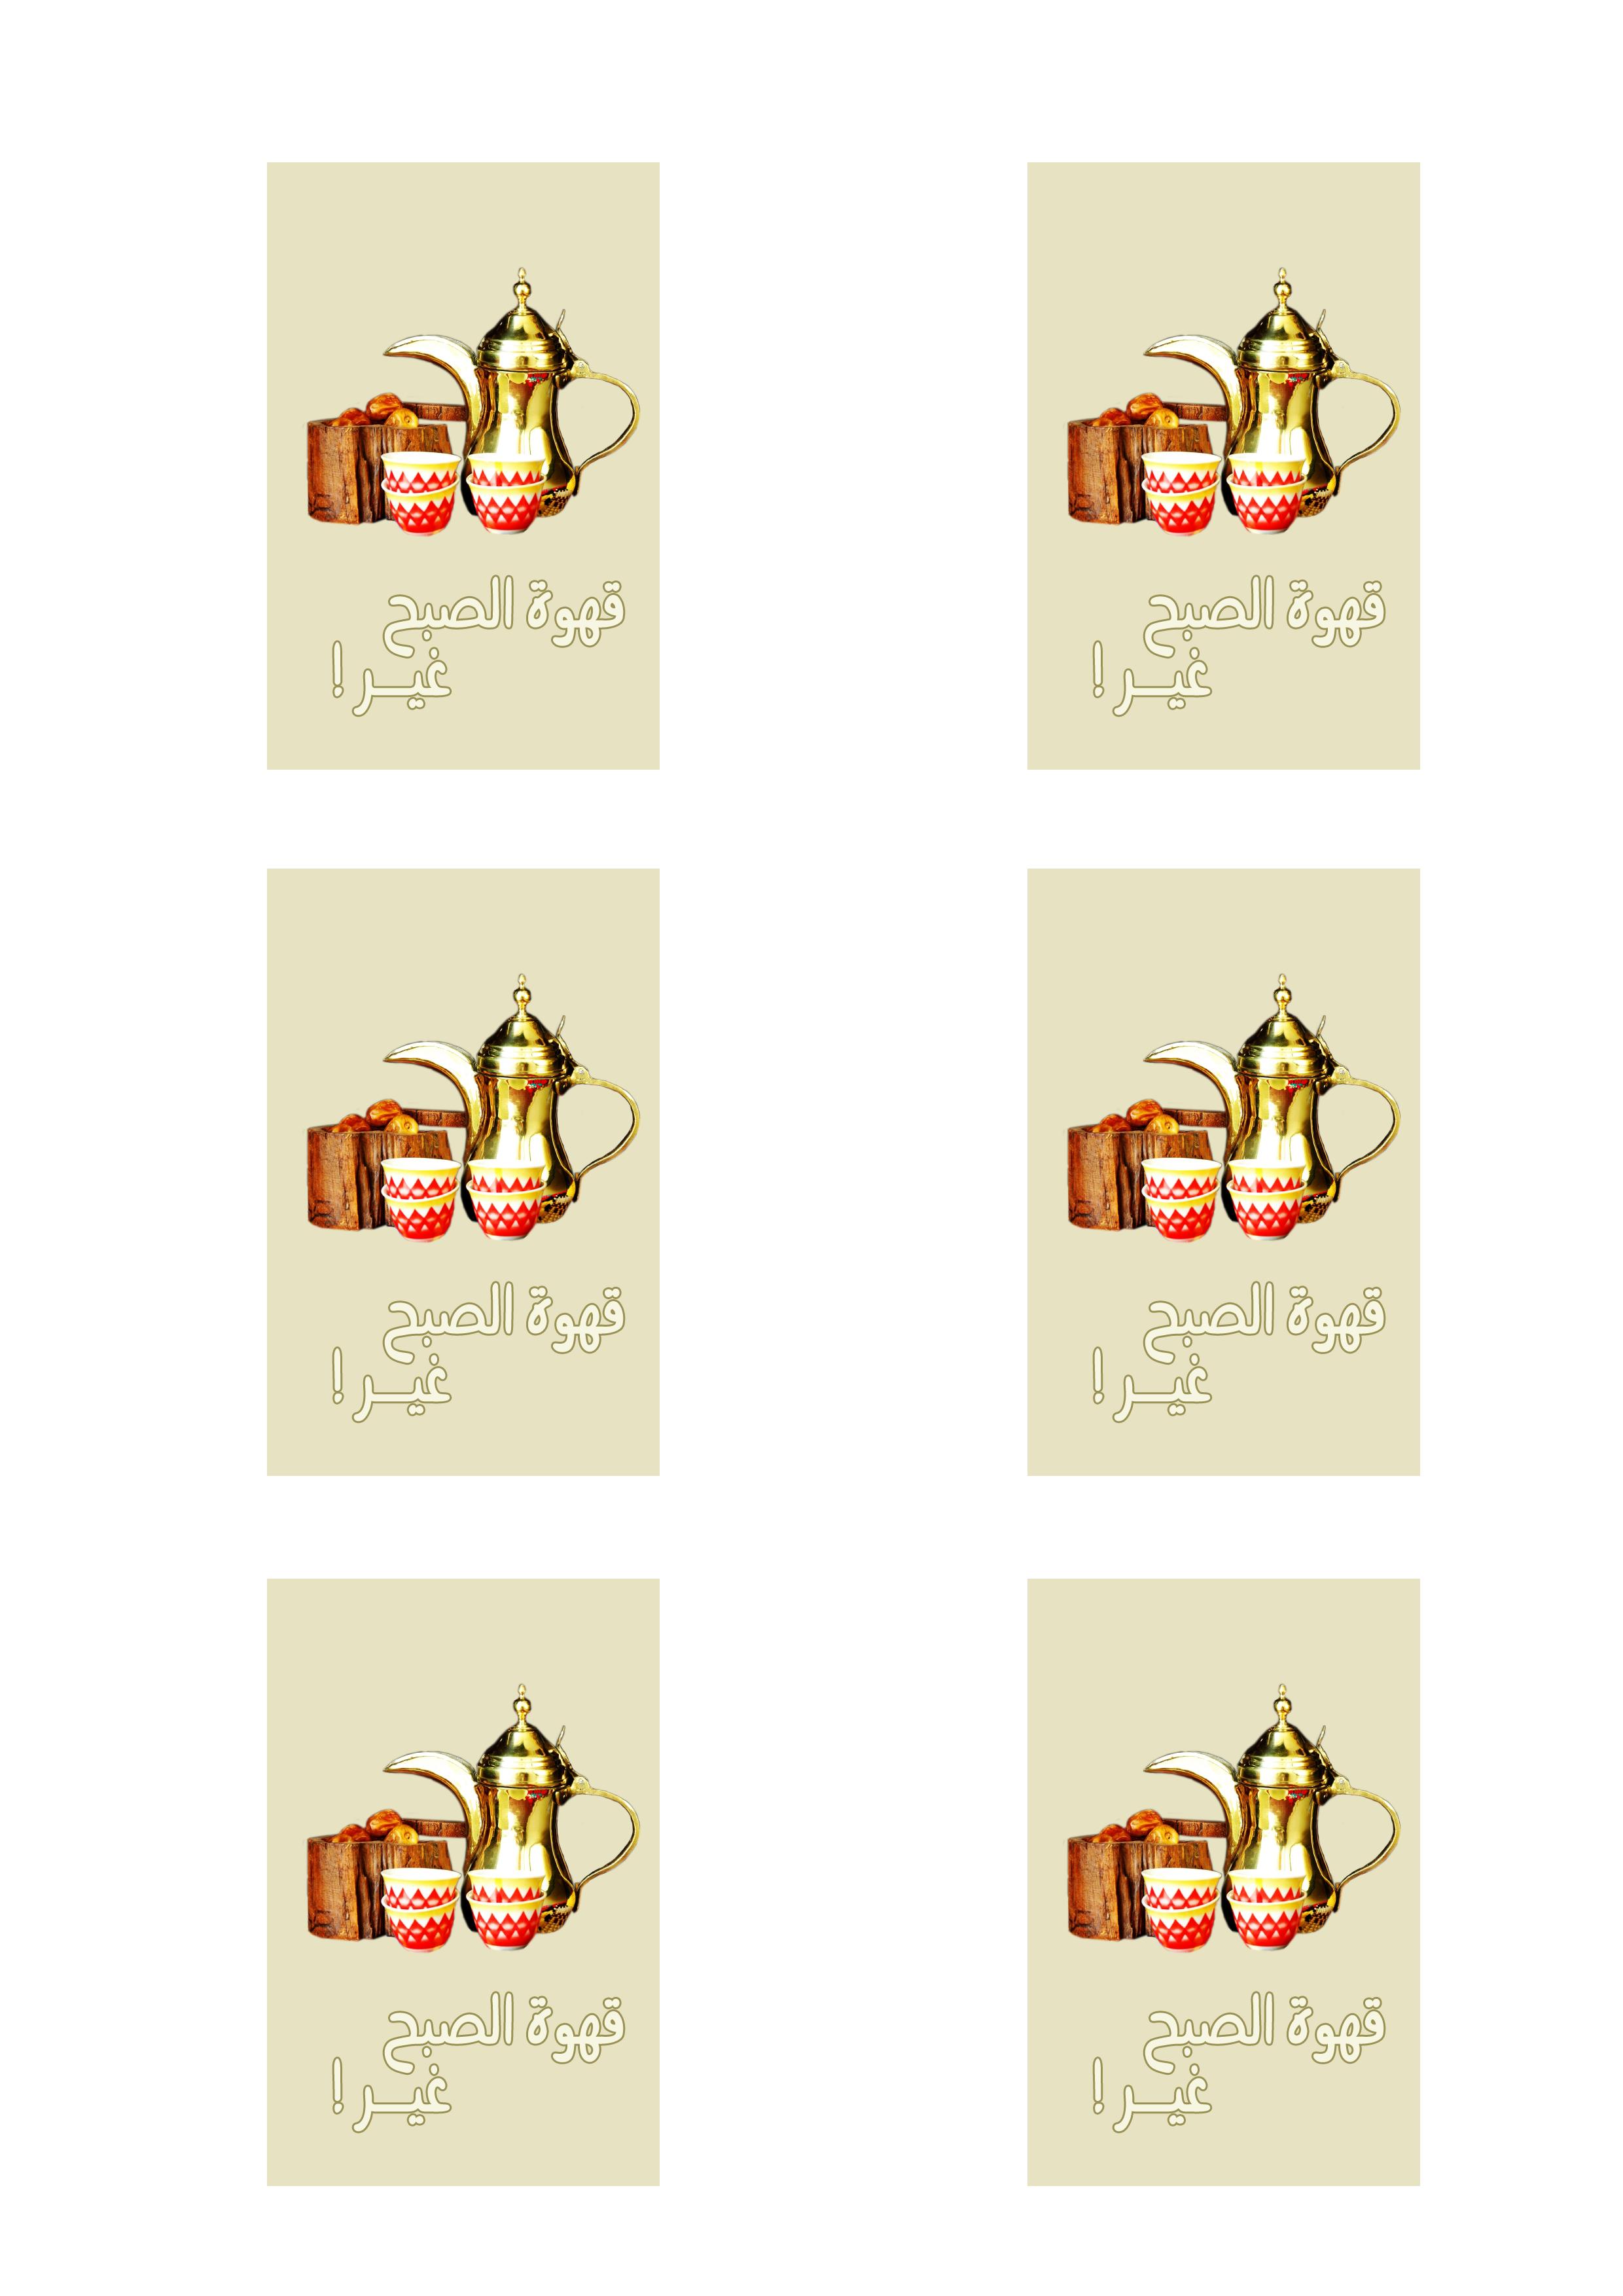 26886c3d6b86aaf017f7baa7072663a7 Png 2480 3508 Arabian Nights Easter Crafts Crafts